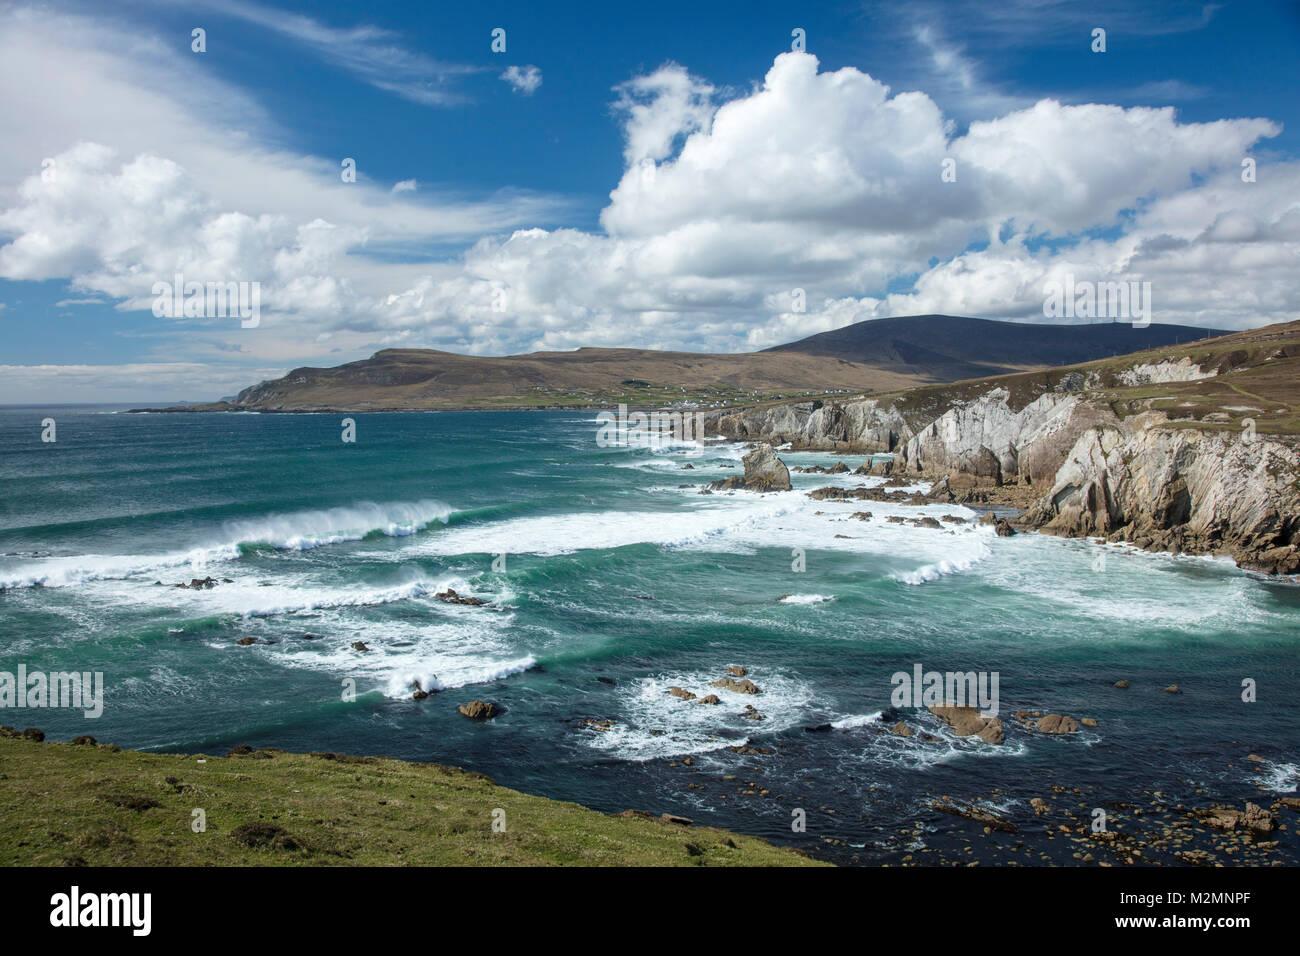 View across Ashleam Bay, Achill Island, County Mayo, Ireland. - Stock Image